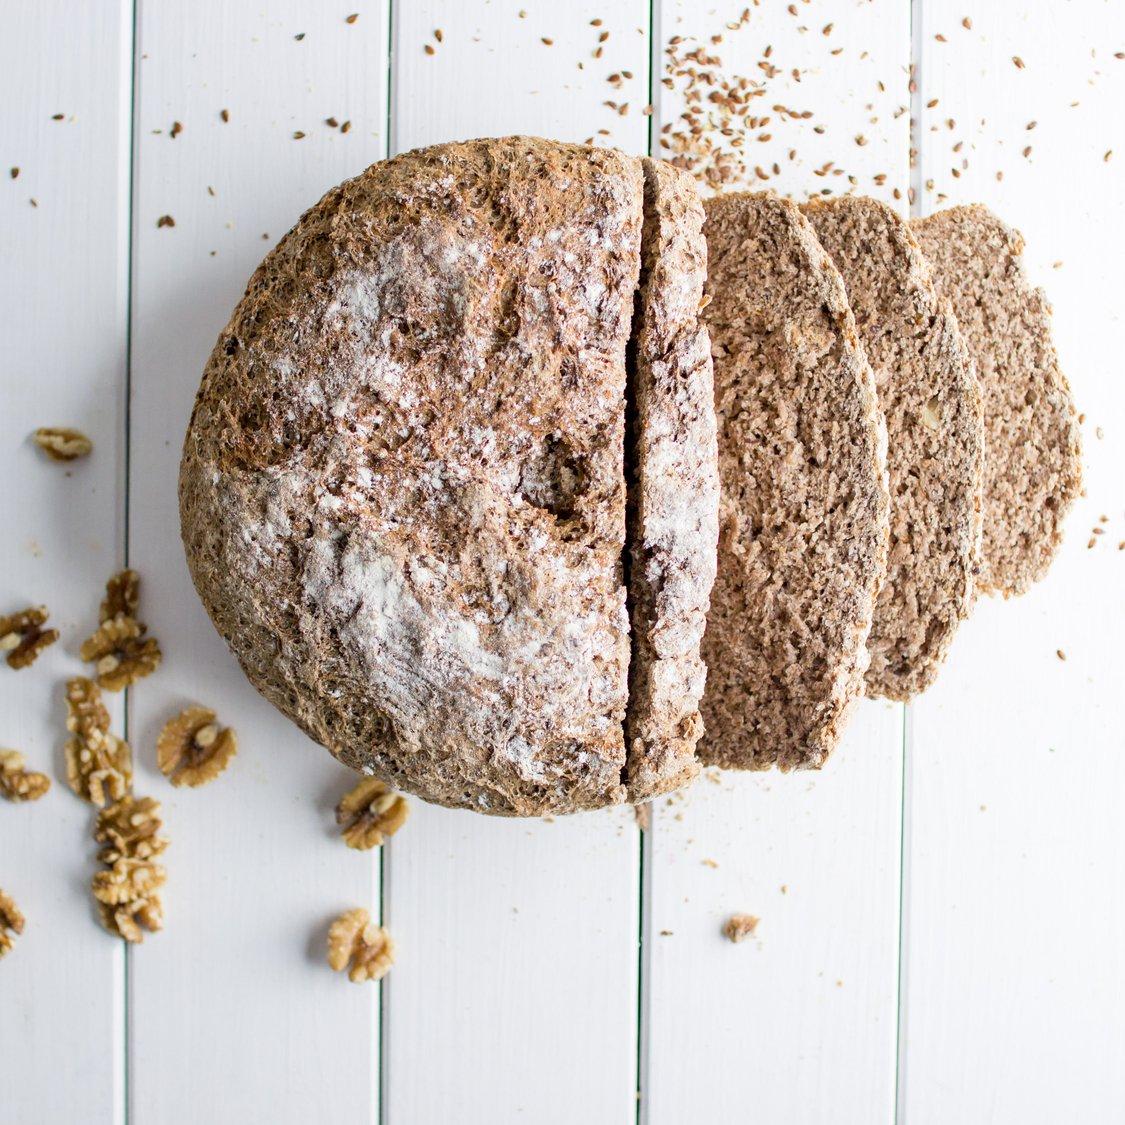 Getreide-Walnuss-Brot